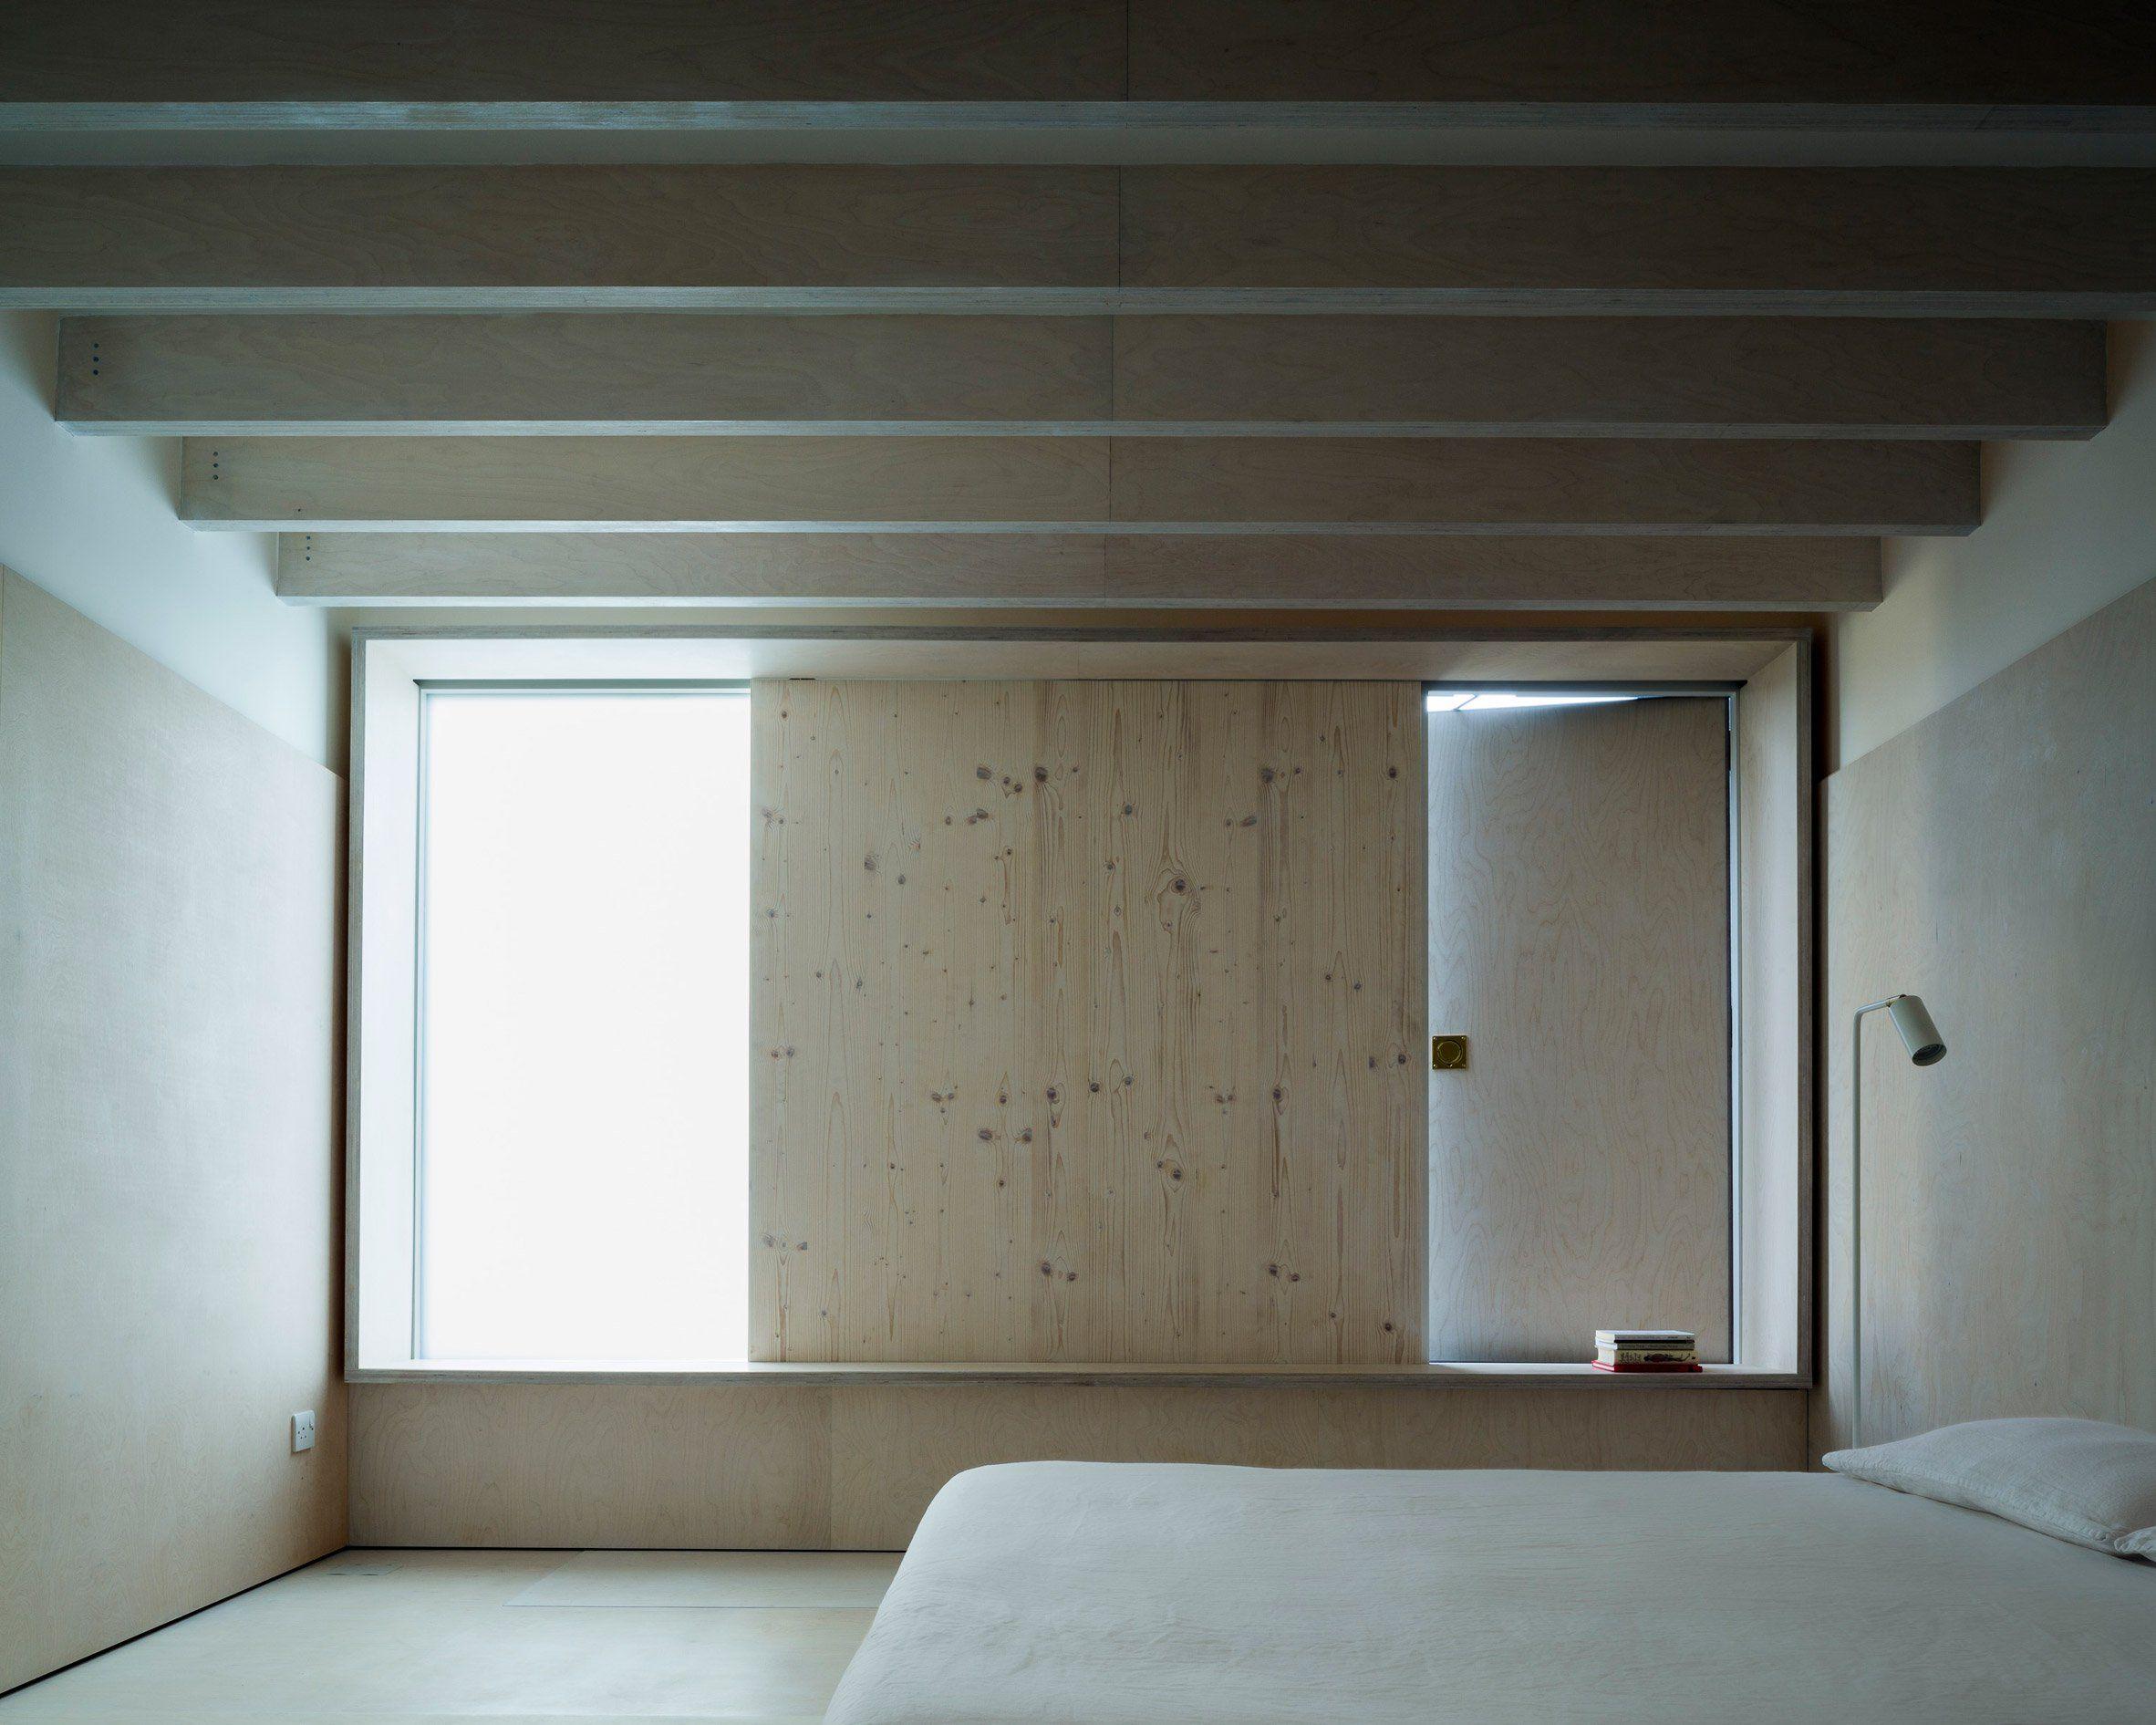 Minimalist methodist church by west architecture ar . interiors